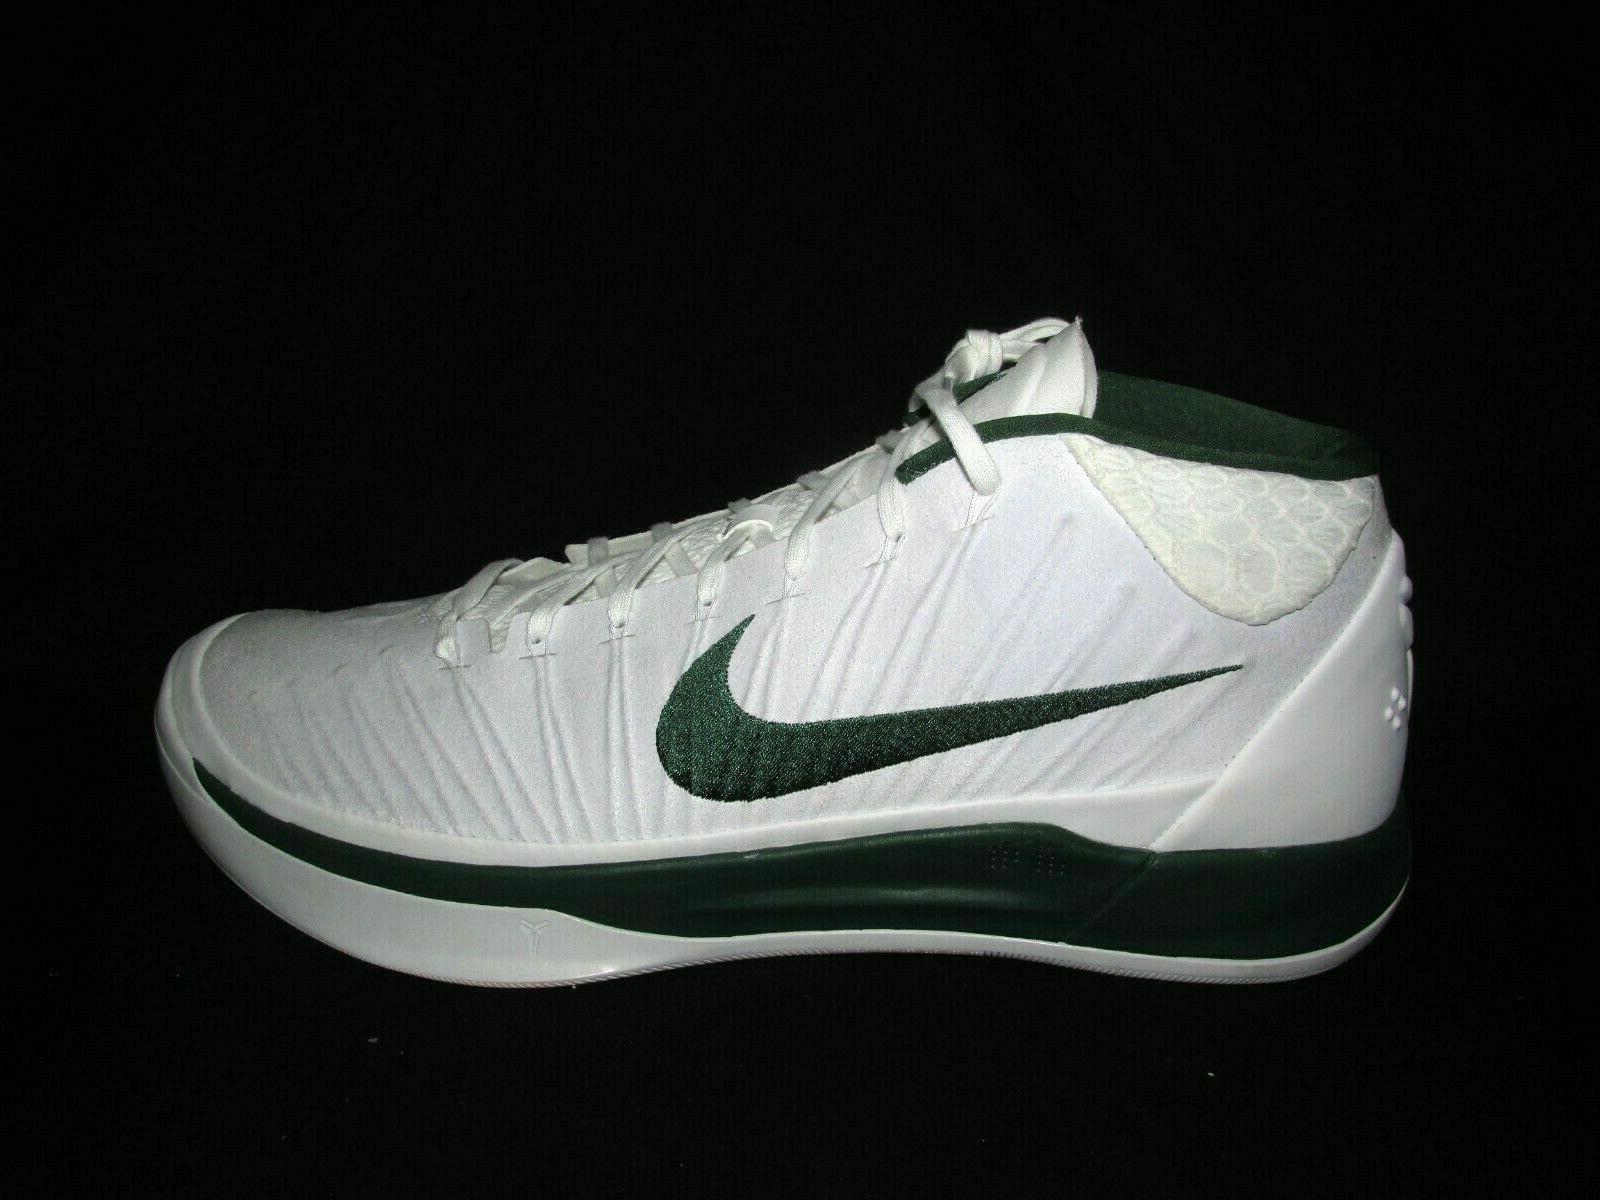 Nike Kobe Mid Basketball Shoes 15 White